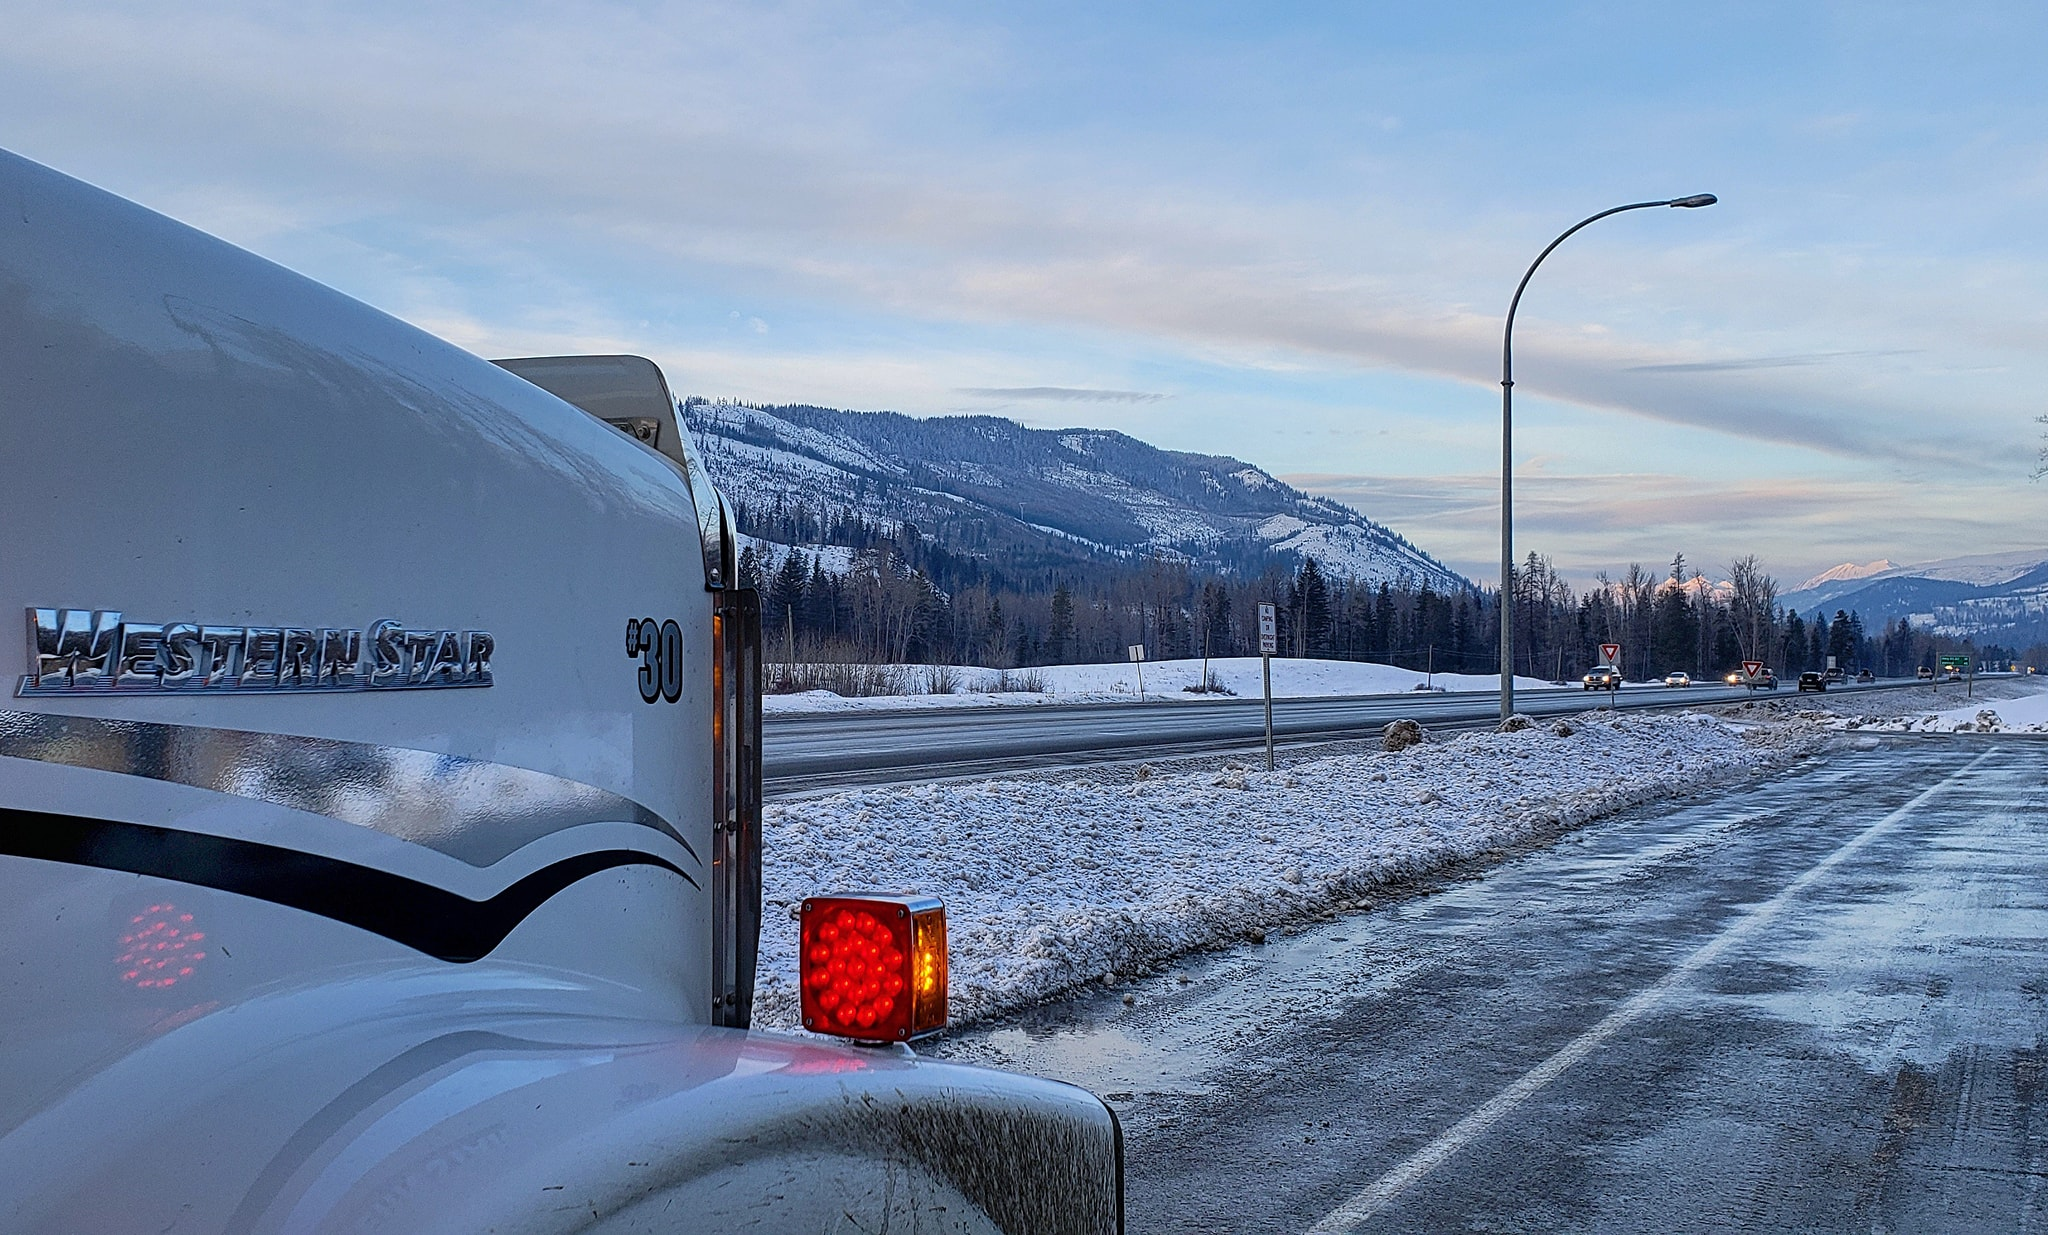 6-1-2019-rondreis-van-2800-km-Montana-Idaho-Oregon-Washington-(6)